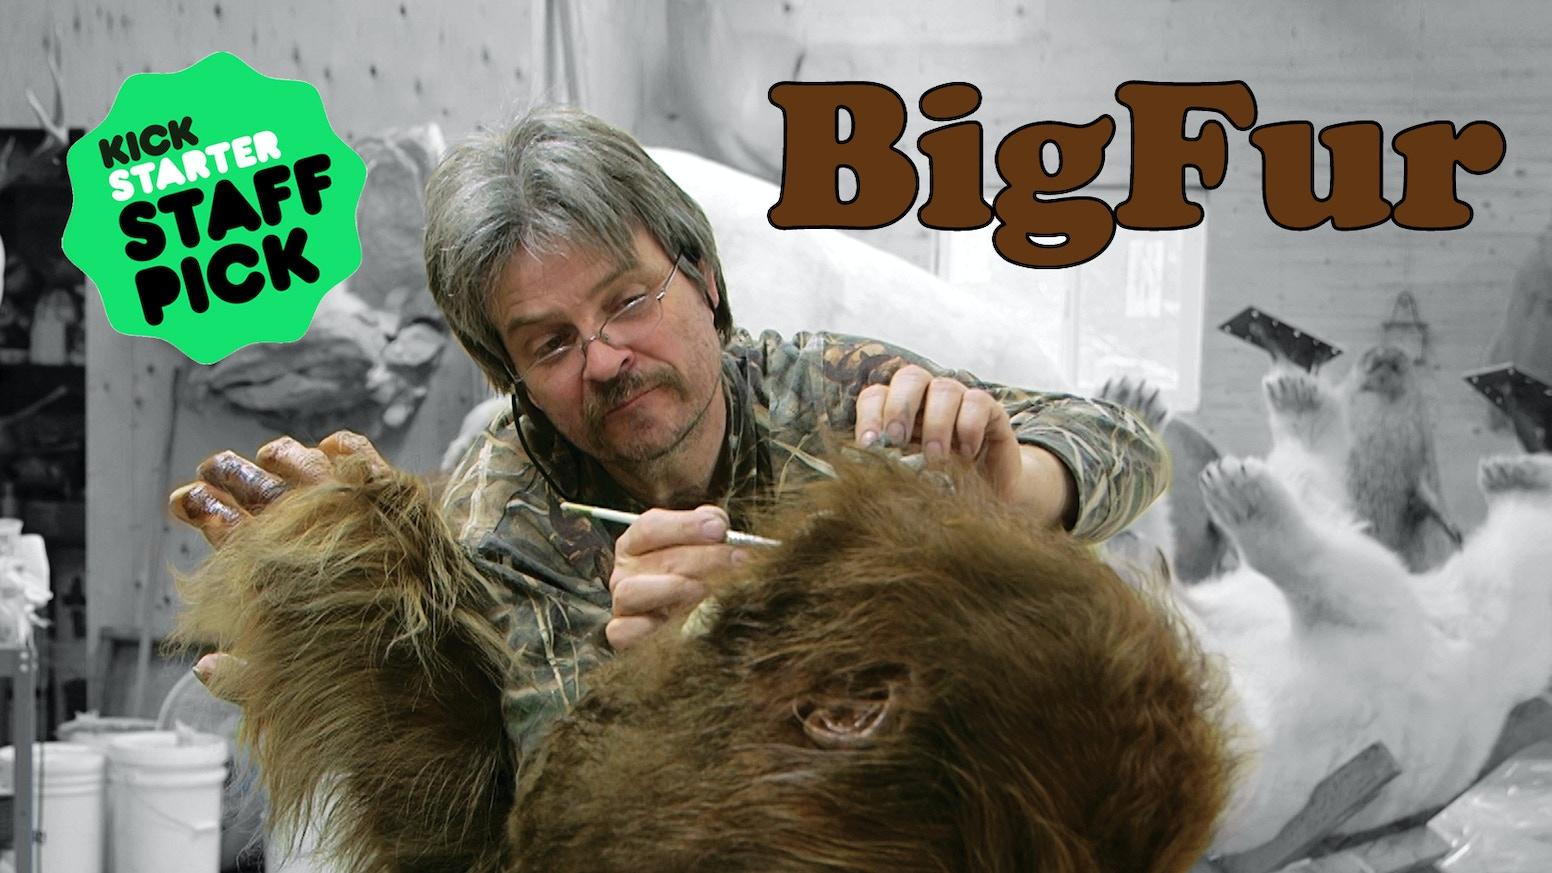 If World Champion taxidermist Ken Walker can't find Bigfoot, he'll make one.